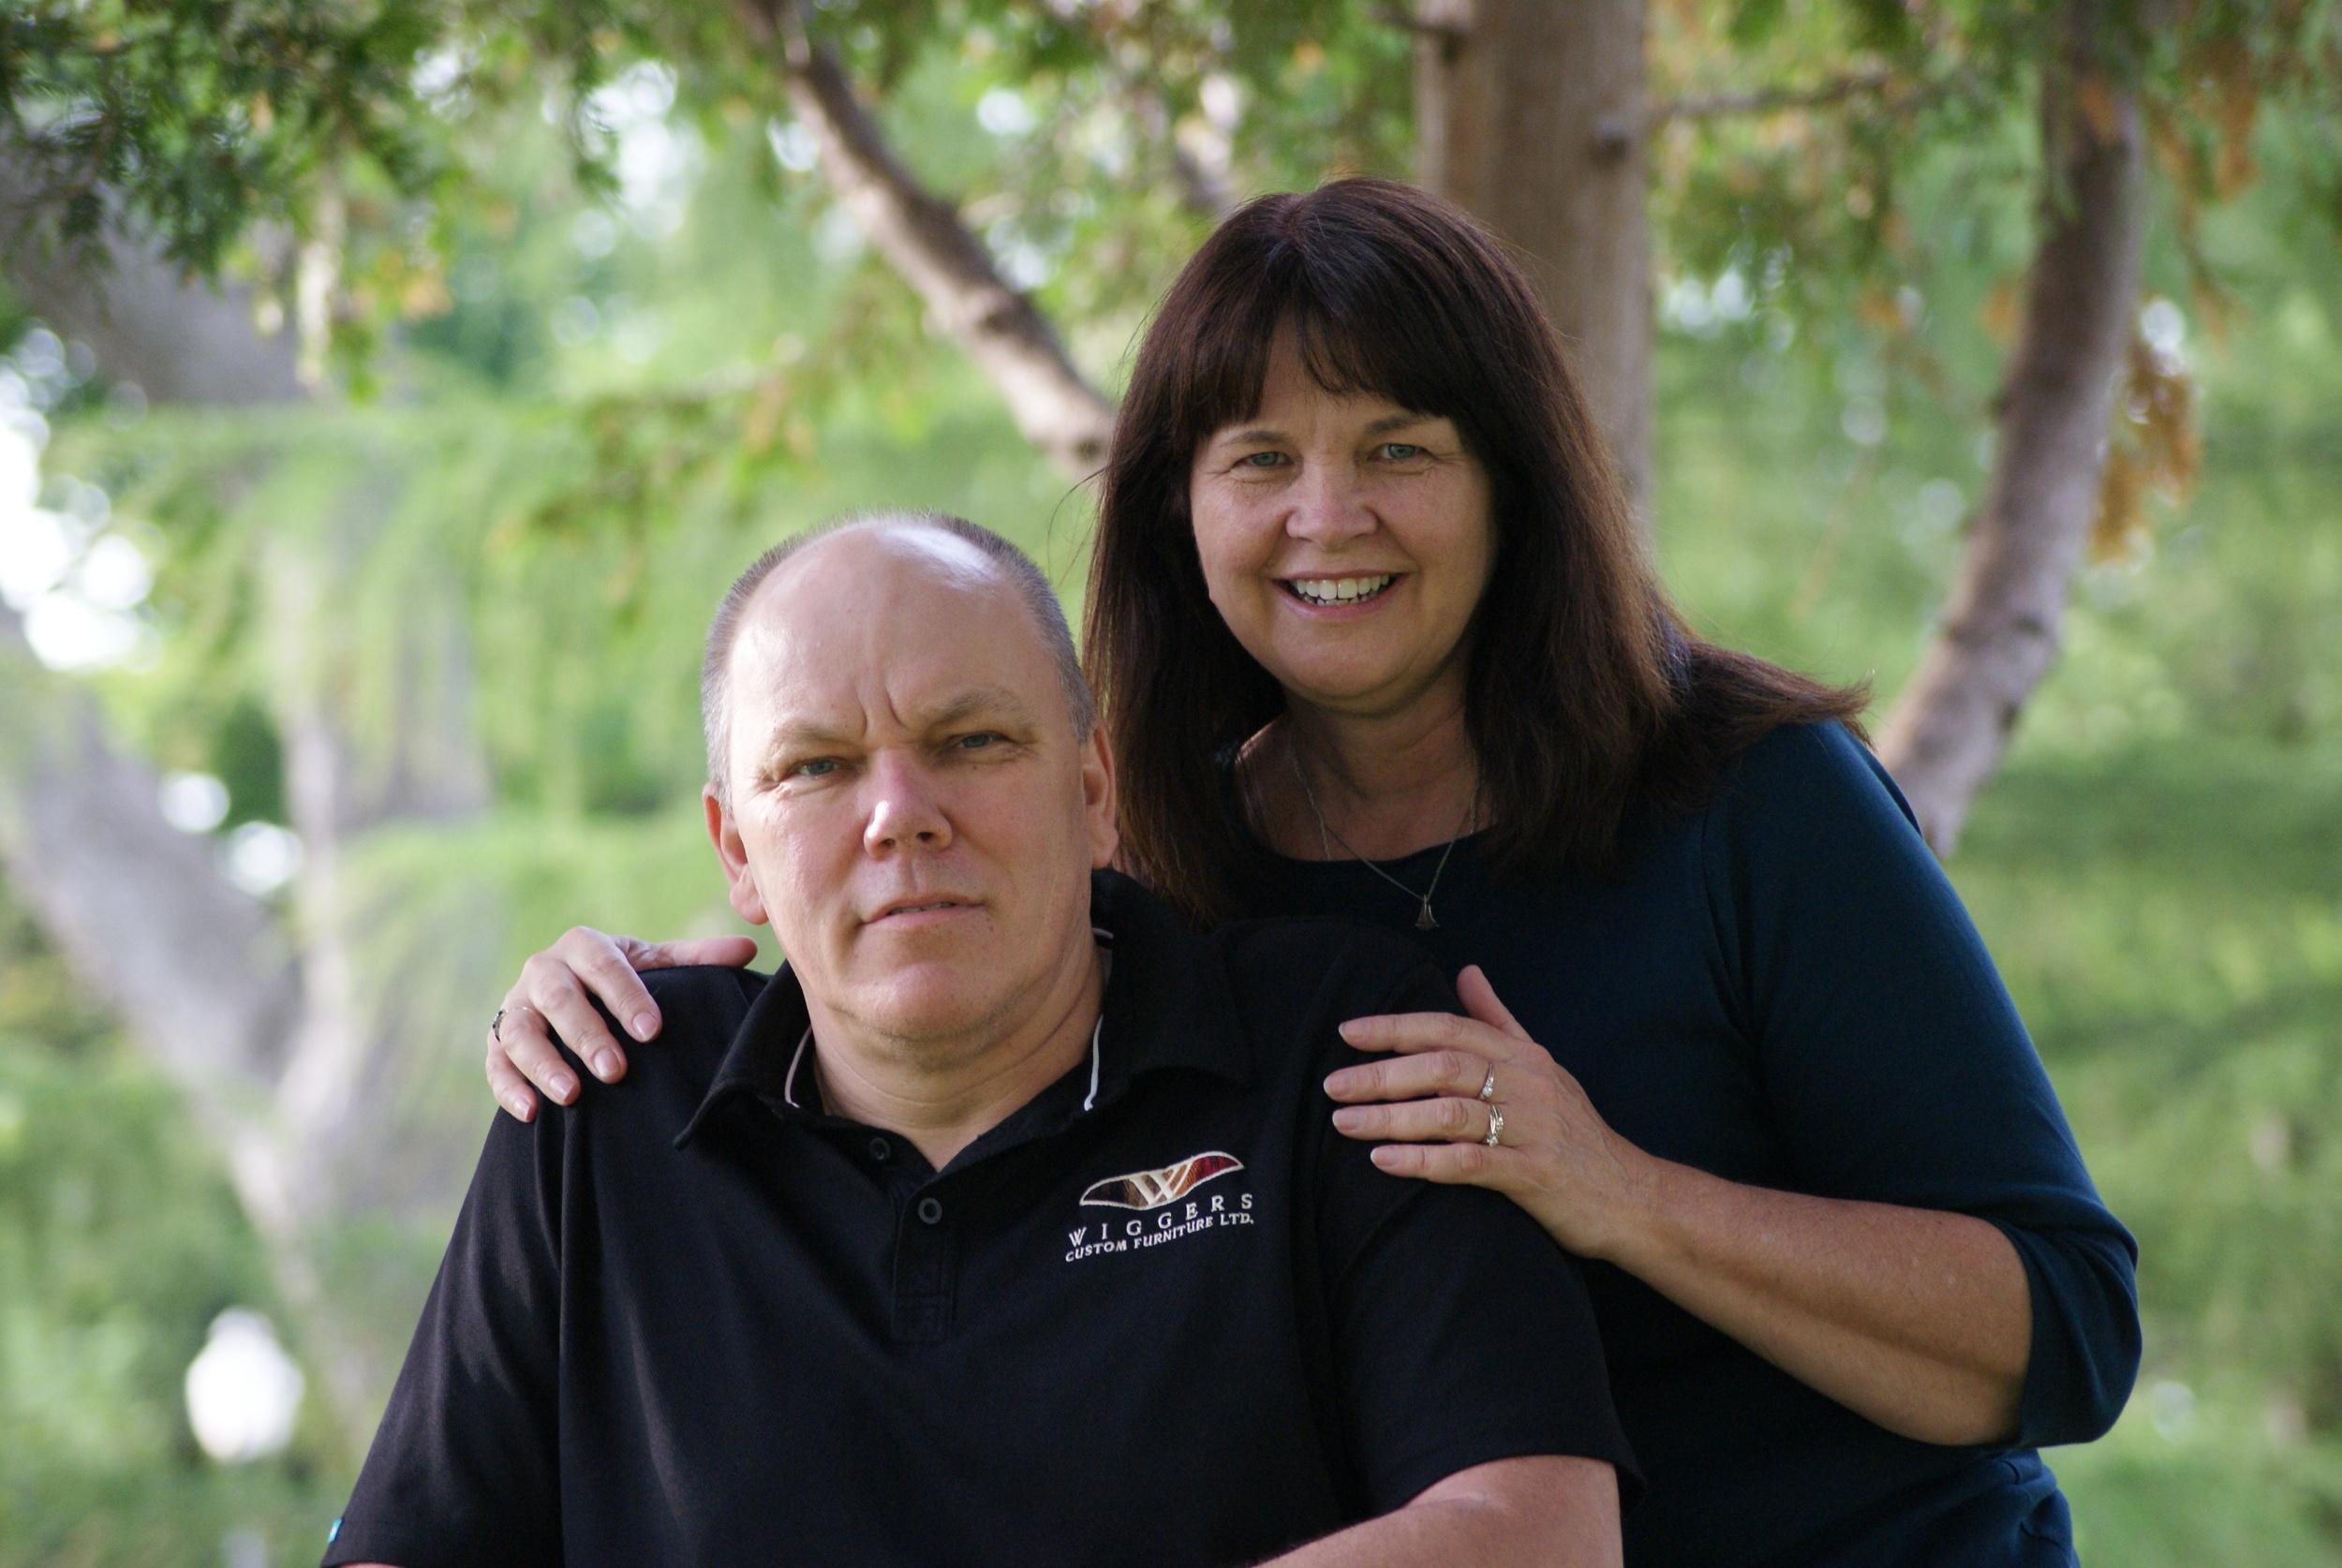 John and Teresa Wiggers